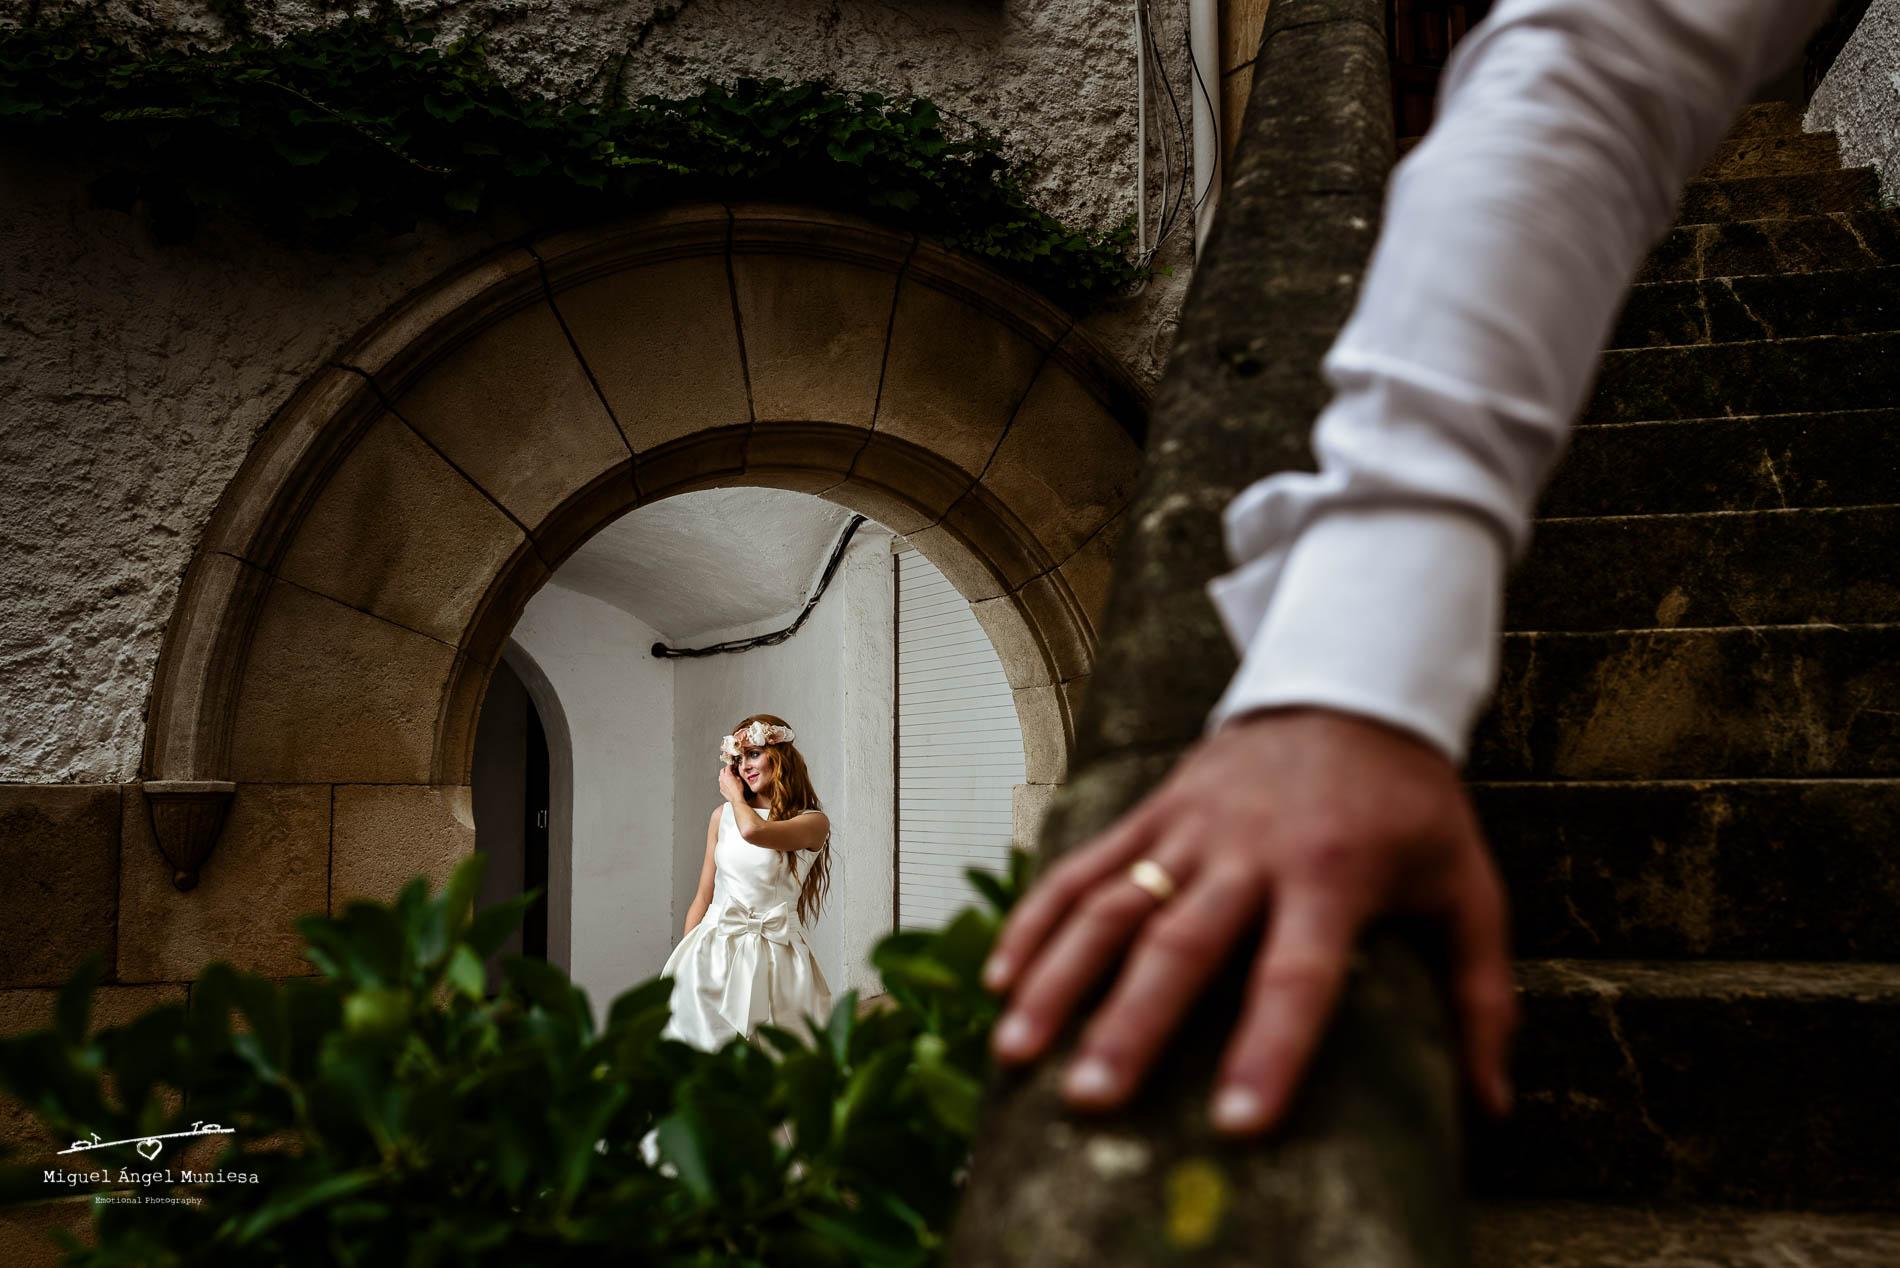 boda, fotografia de boda, boda zaragoza, fotografia, wedding, wedding photography, miguel angel muniesa, fotografo boda Zaragoza, fotografo boda, destination wedding_ 0009